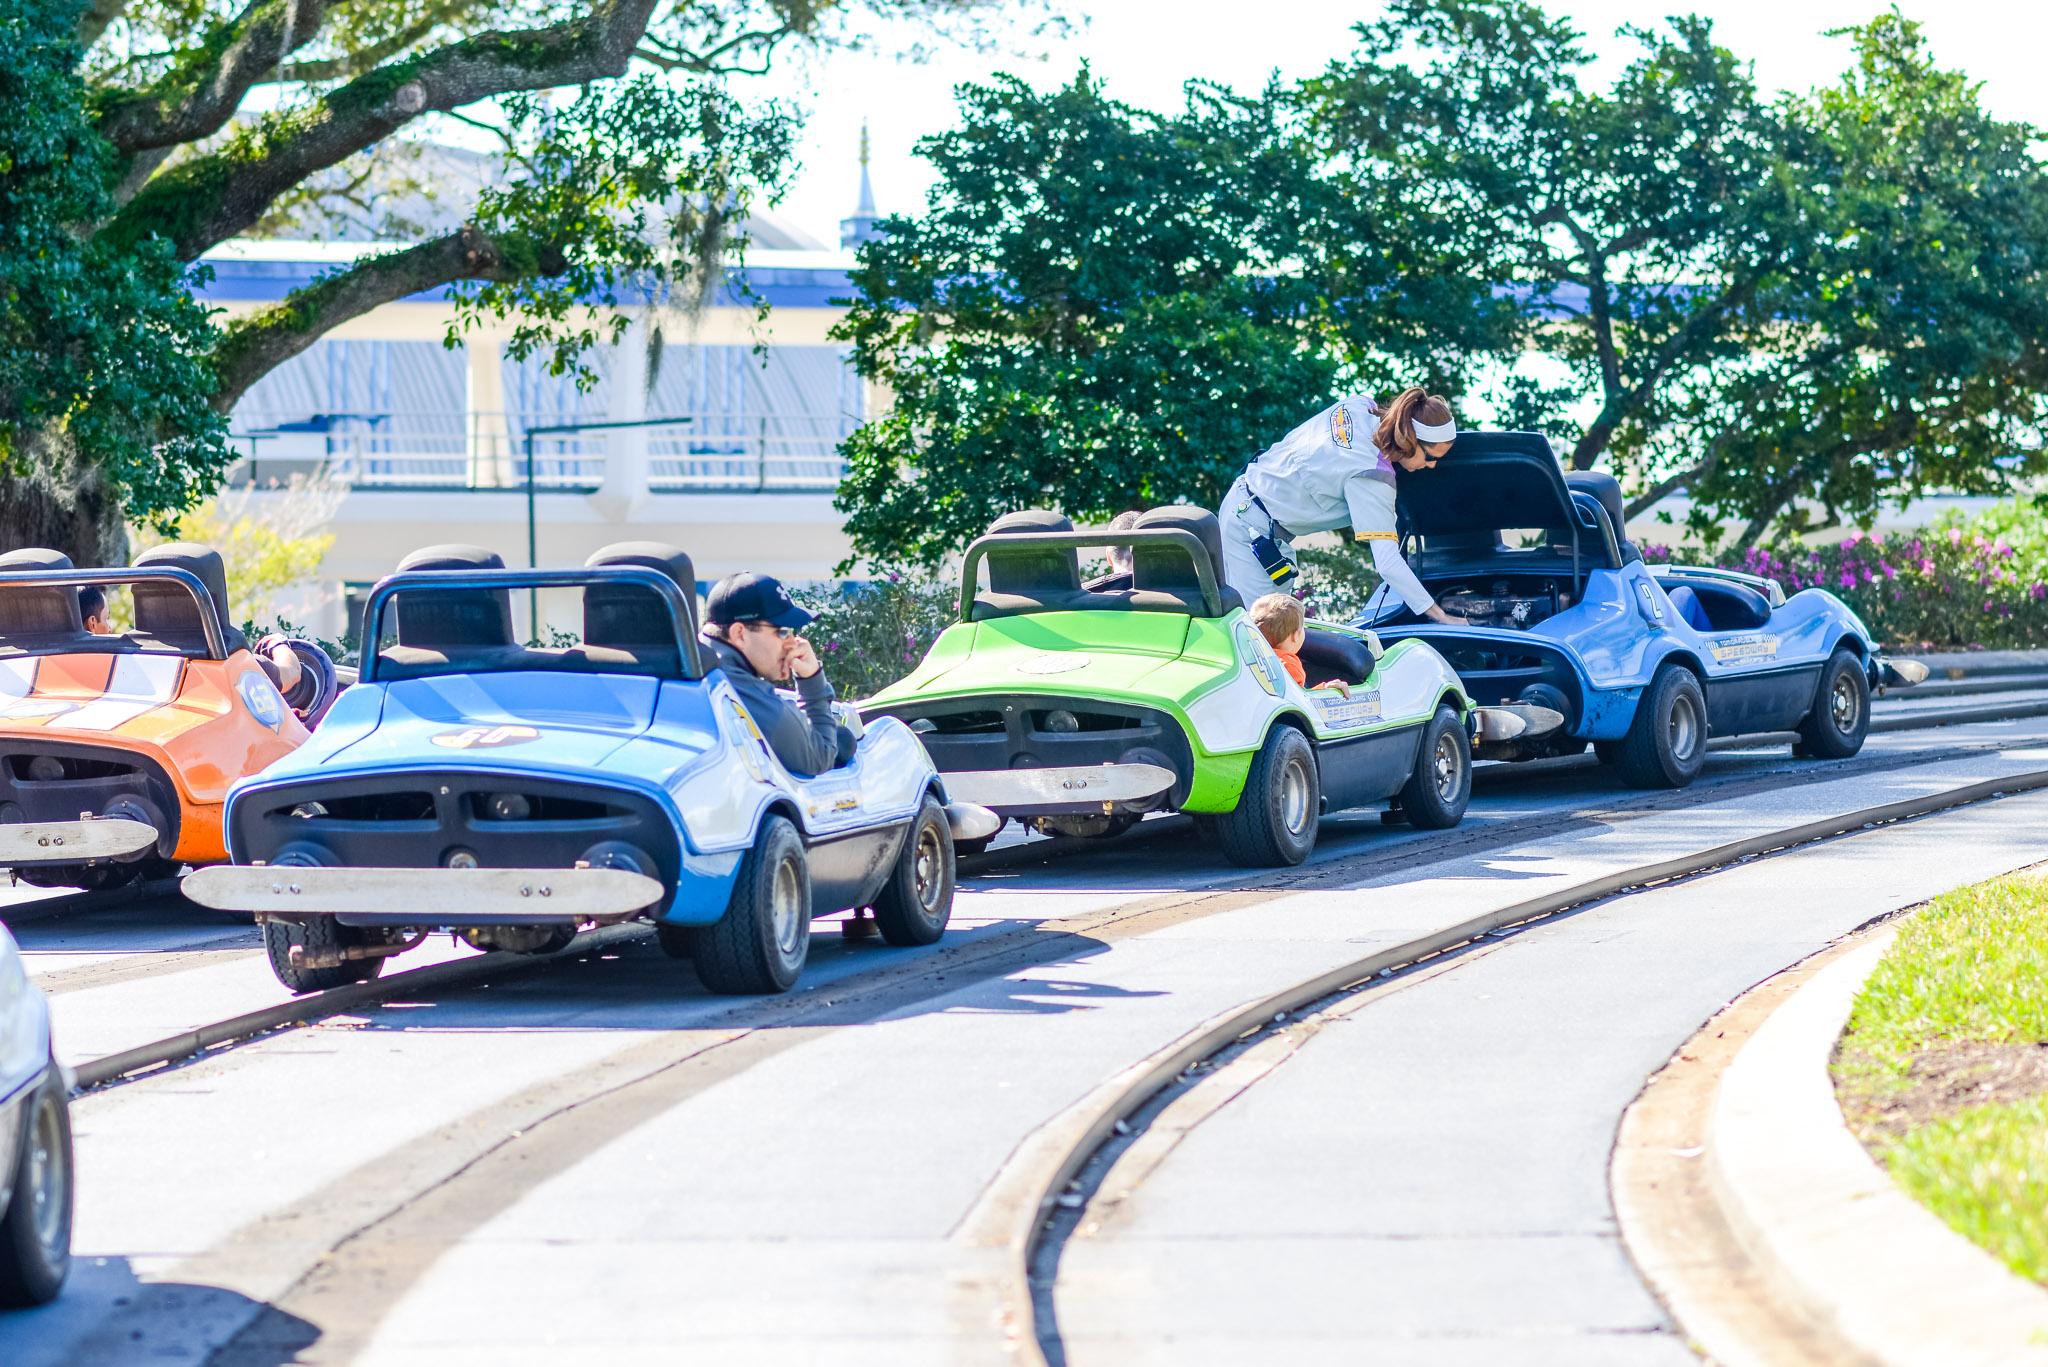 Tomorrowland Speedway Repairs - Walt Disney World Magic Kingdom